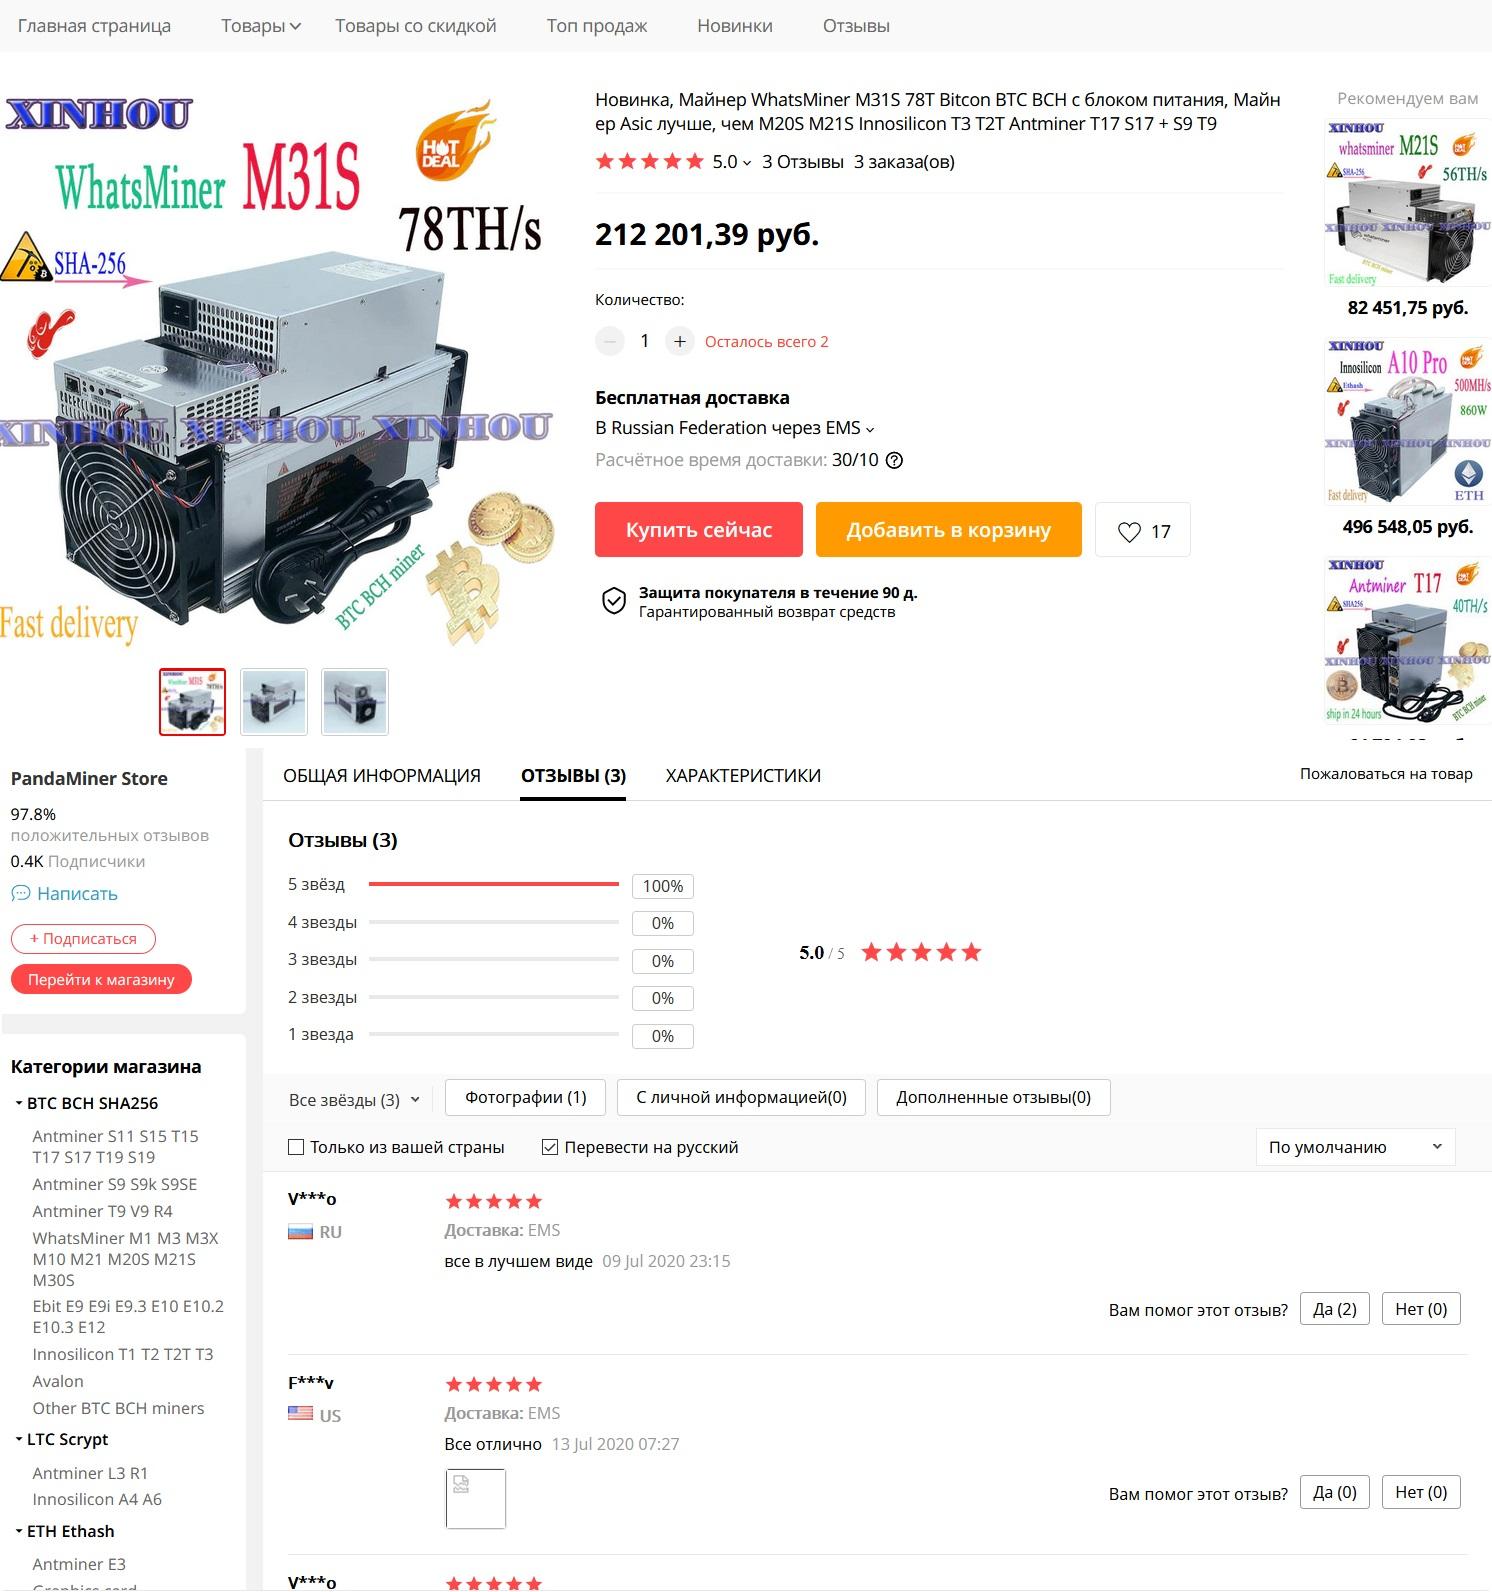 Майнер WhatsMiner M31S